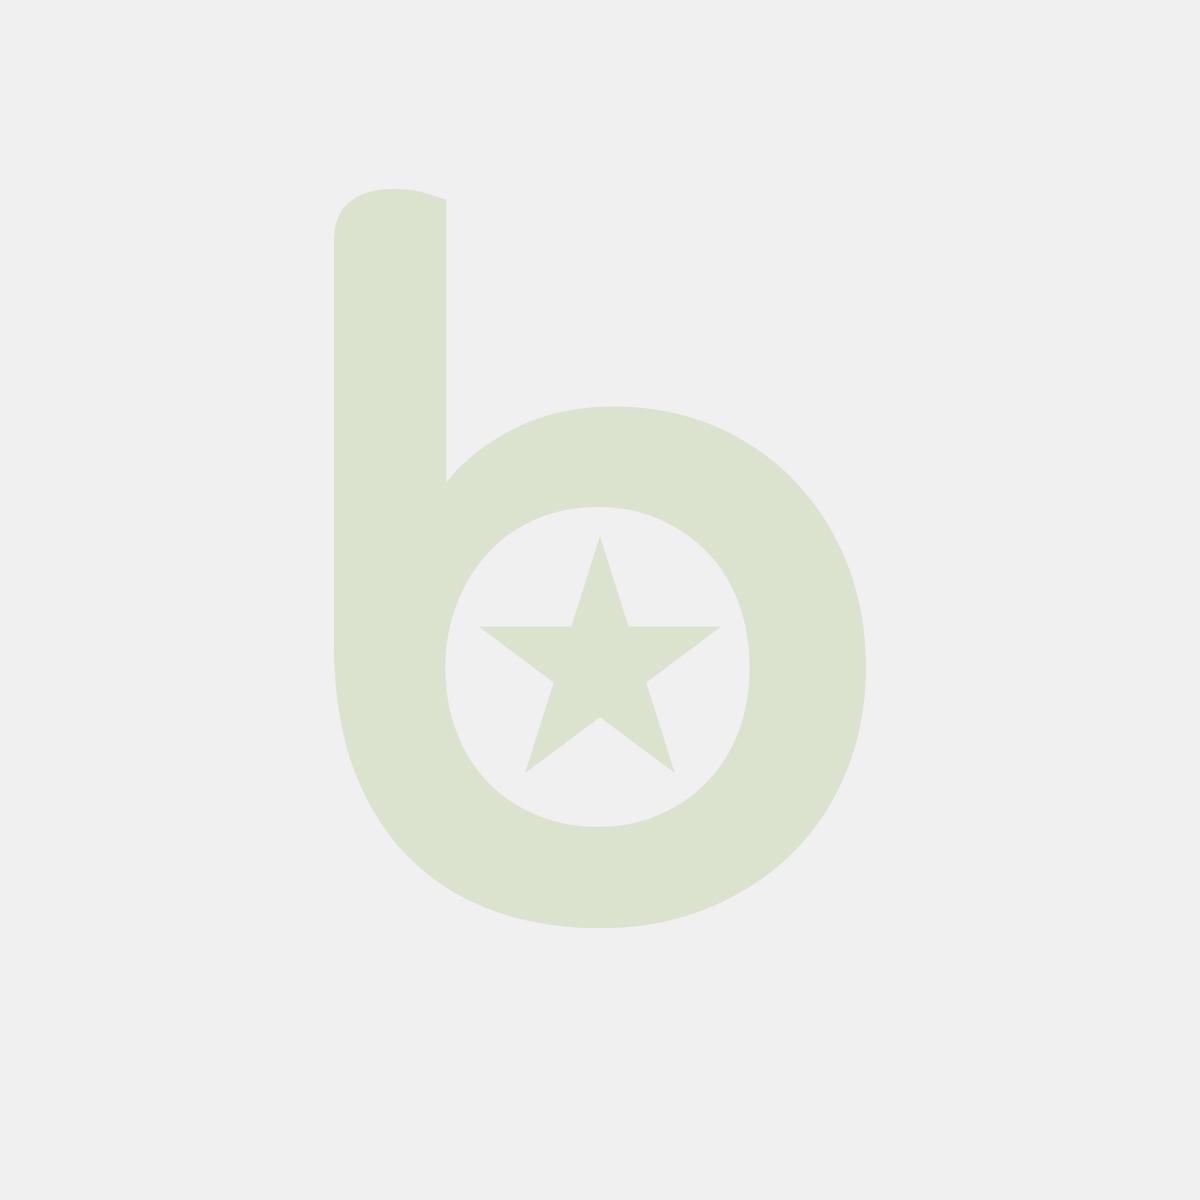 Serwetki PAPSTAR Royal Collection Berryrose 40x40 bordowy, opakowanie 50szt